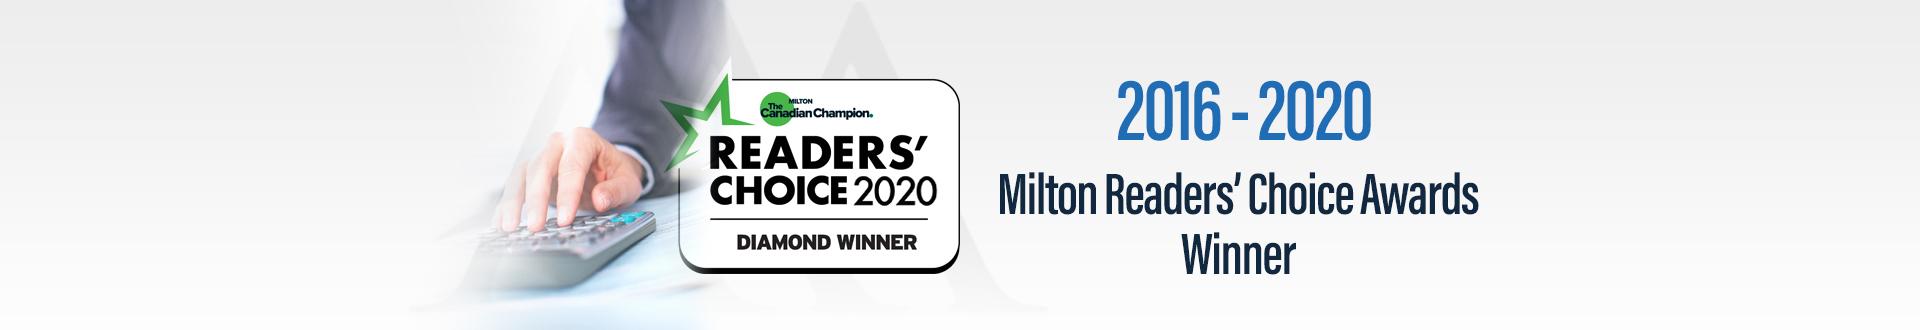 2016 to 2020 Award winner